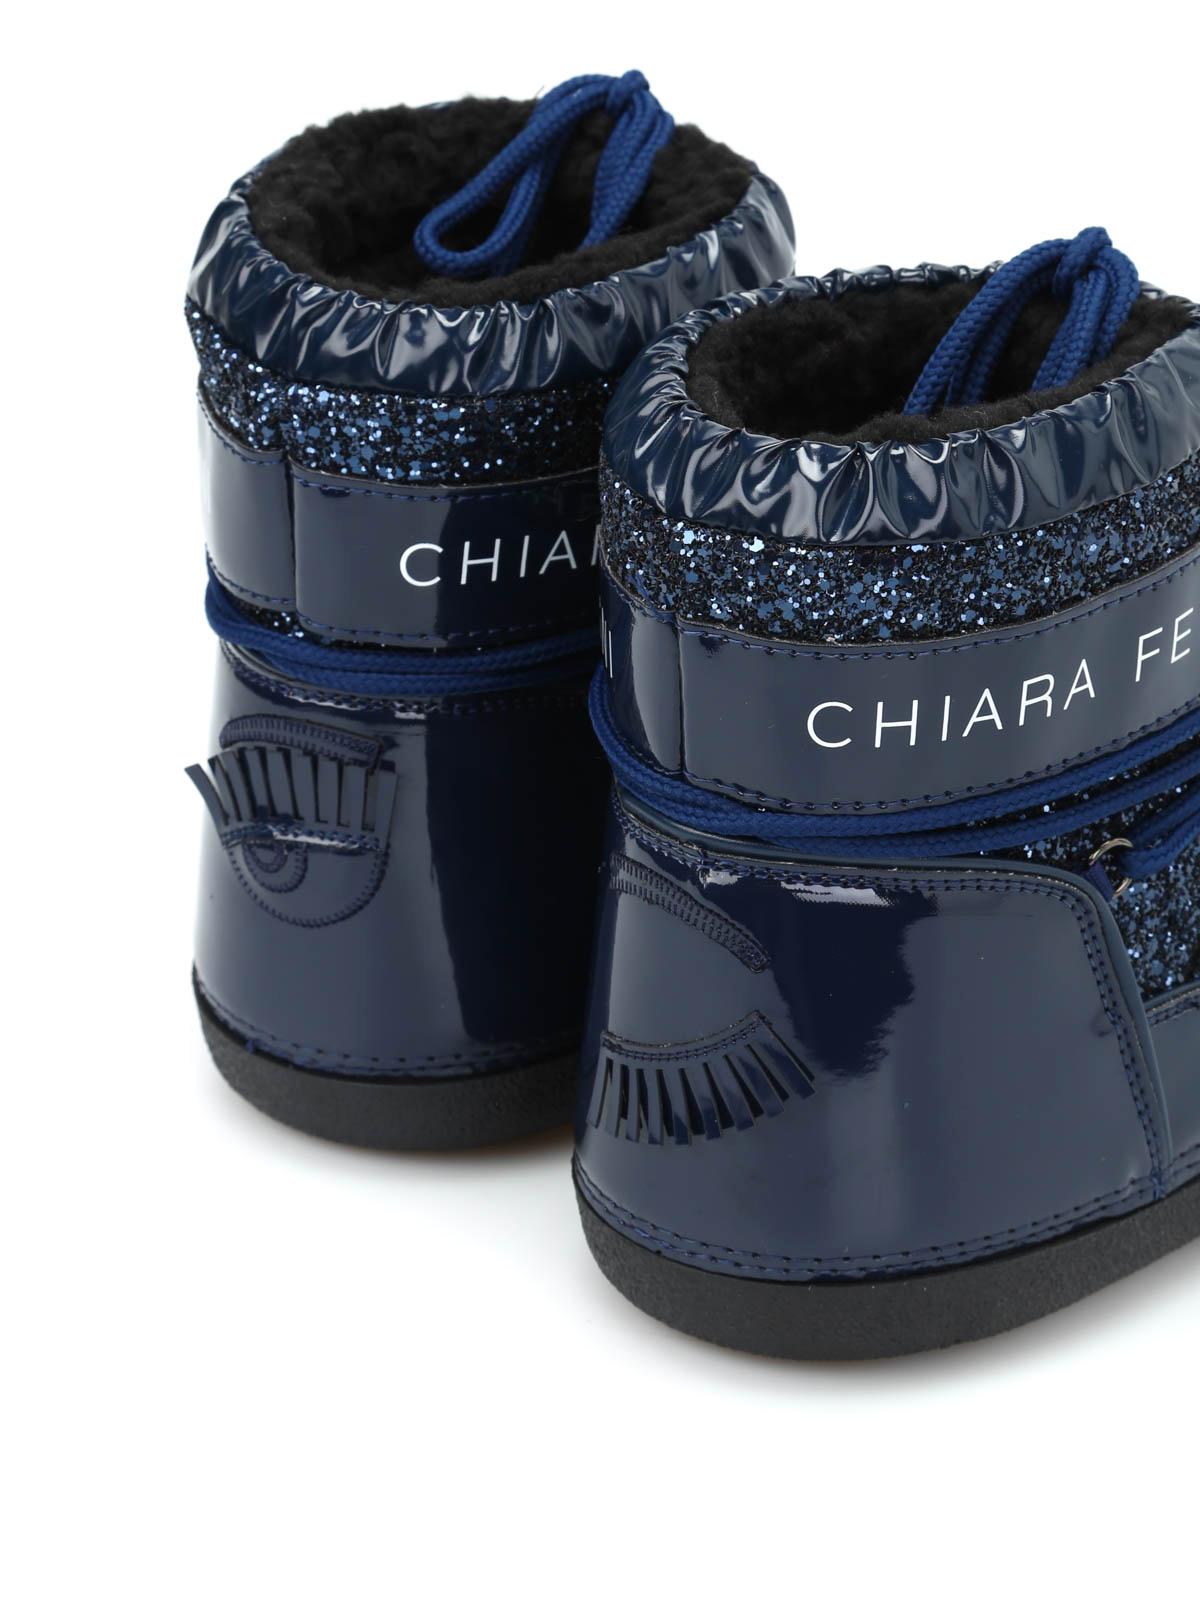 Chiara Ferragni Moon boot medi glitterati stivali